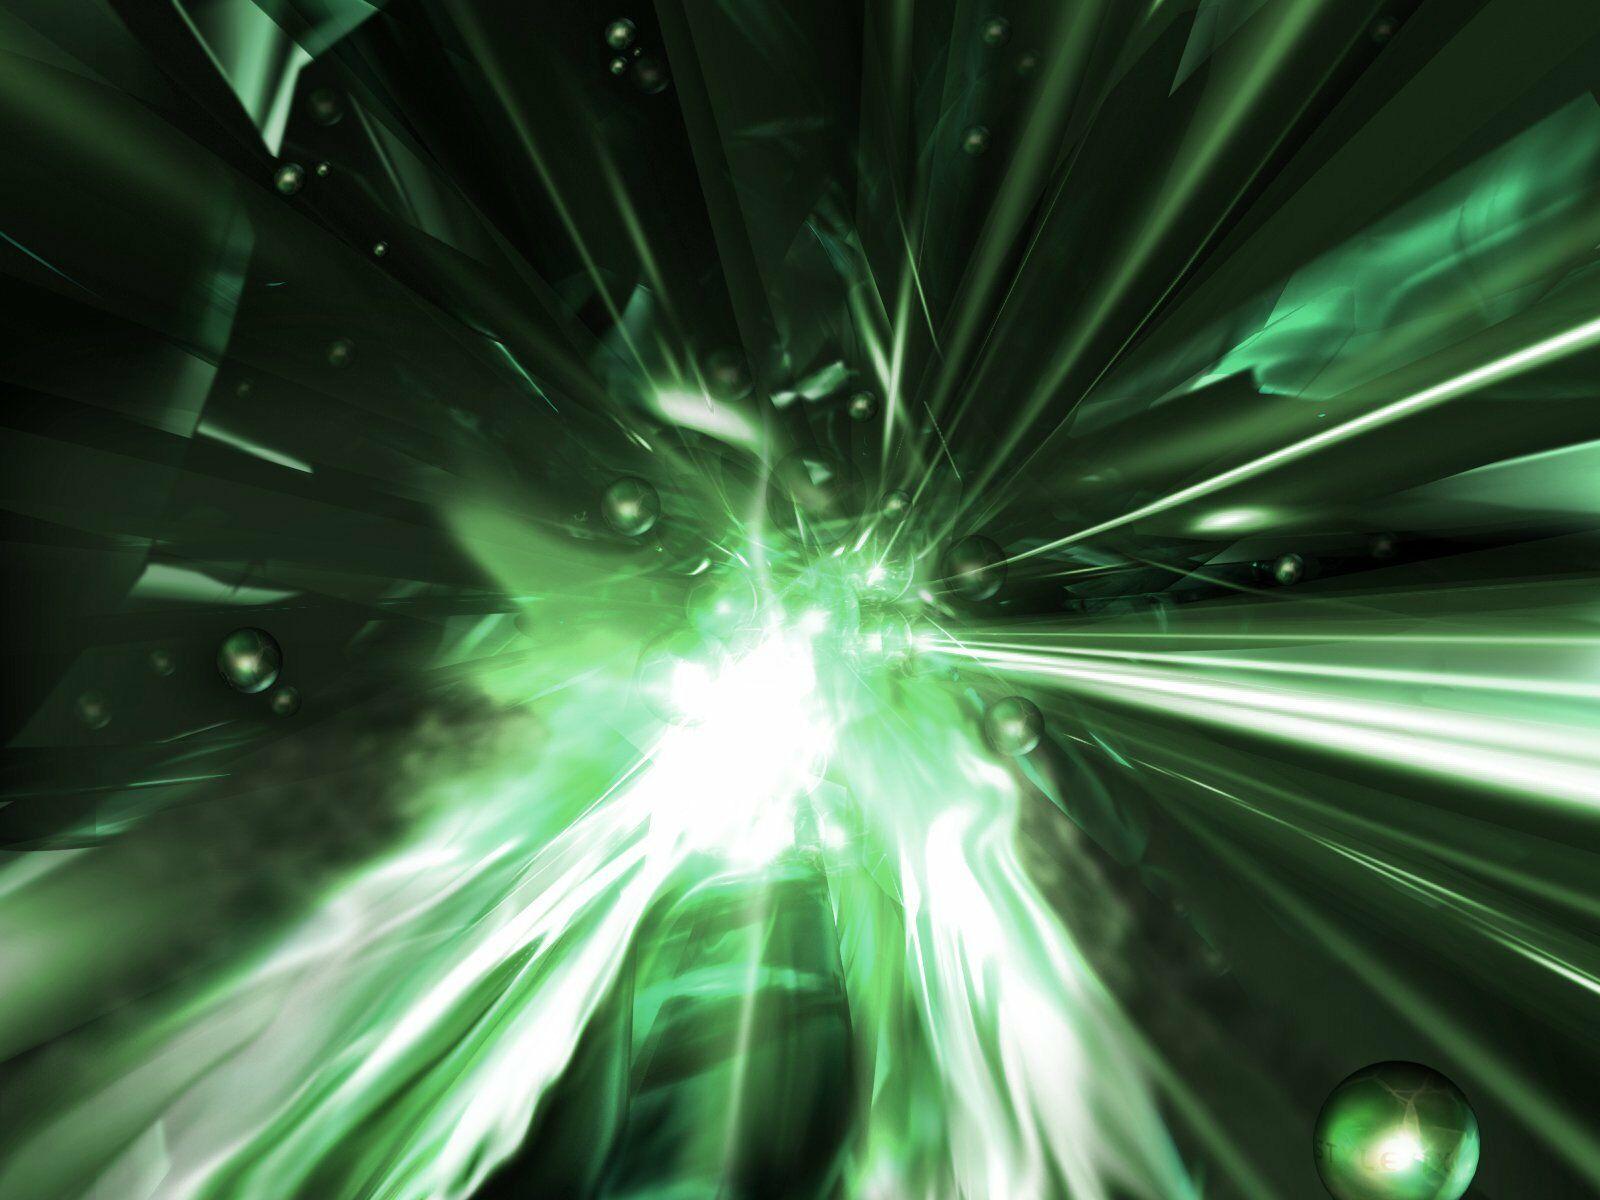 Previous Abstract Wallpaper Green Lightning